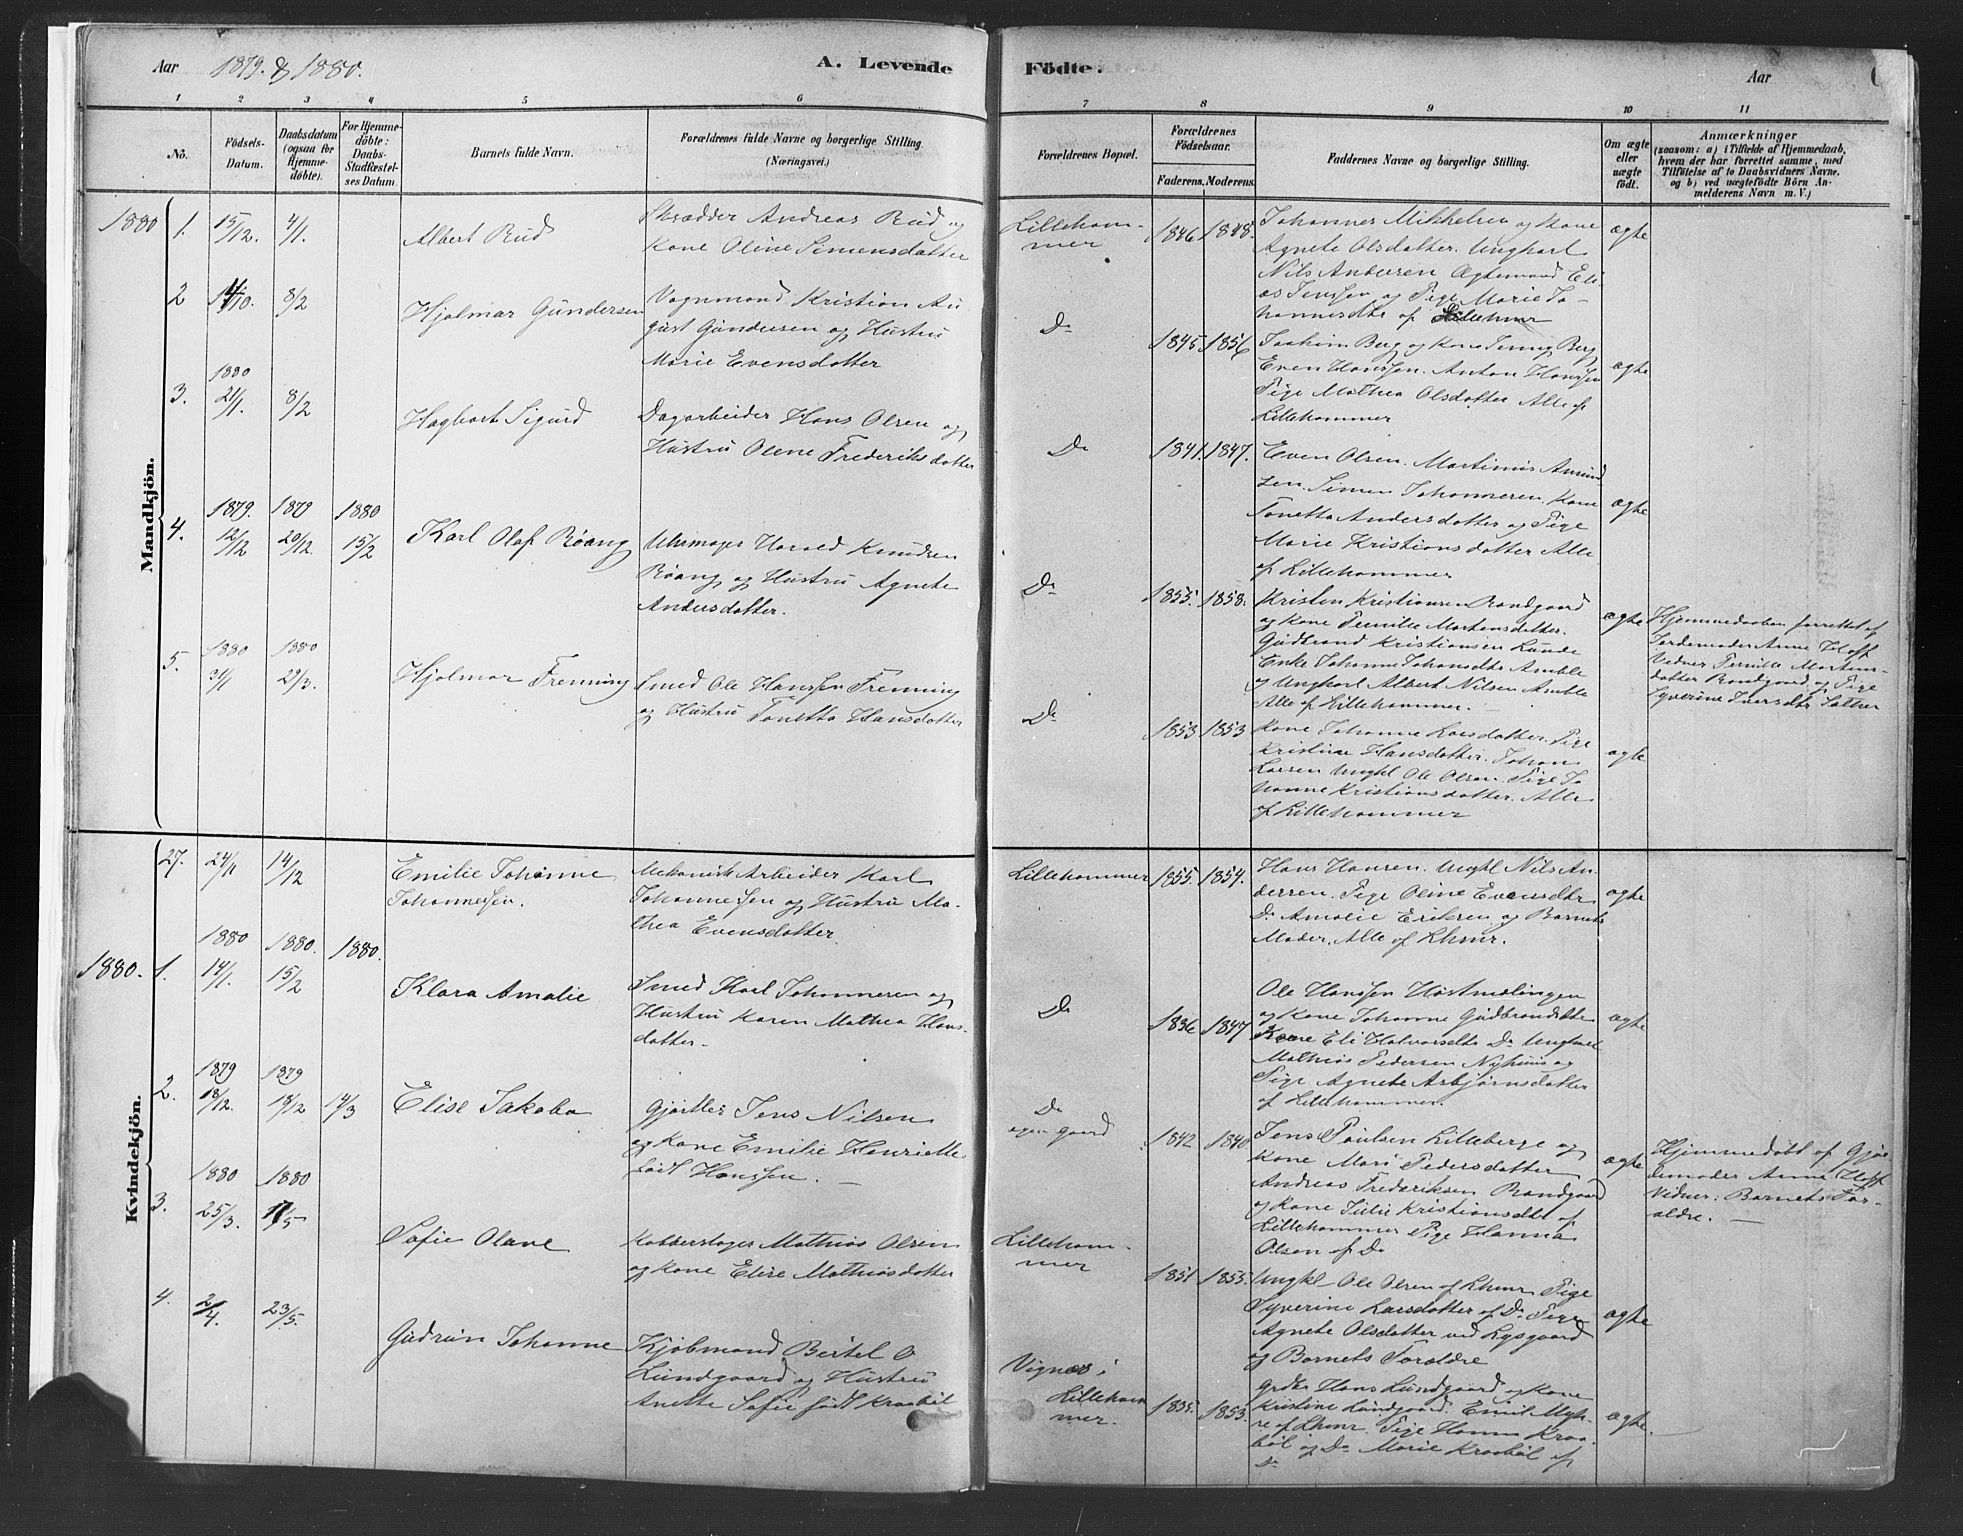 SAH, Fåberg prestekontor, Ministerialbok nr. 10, 1879-1900, s. 6